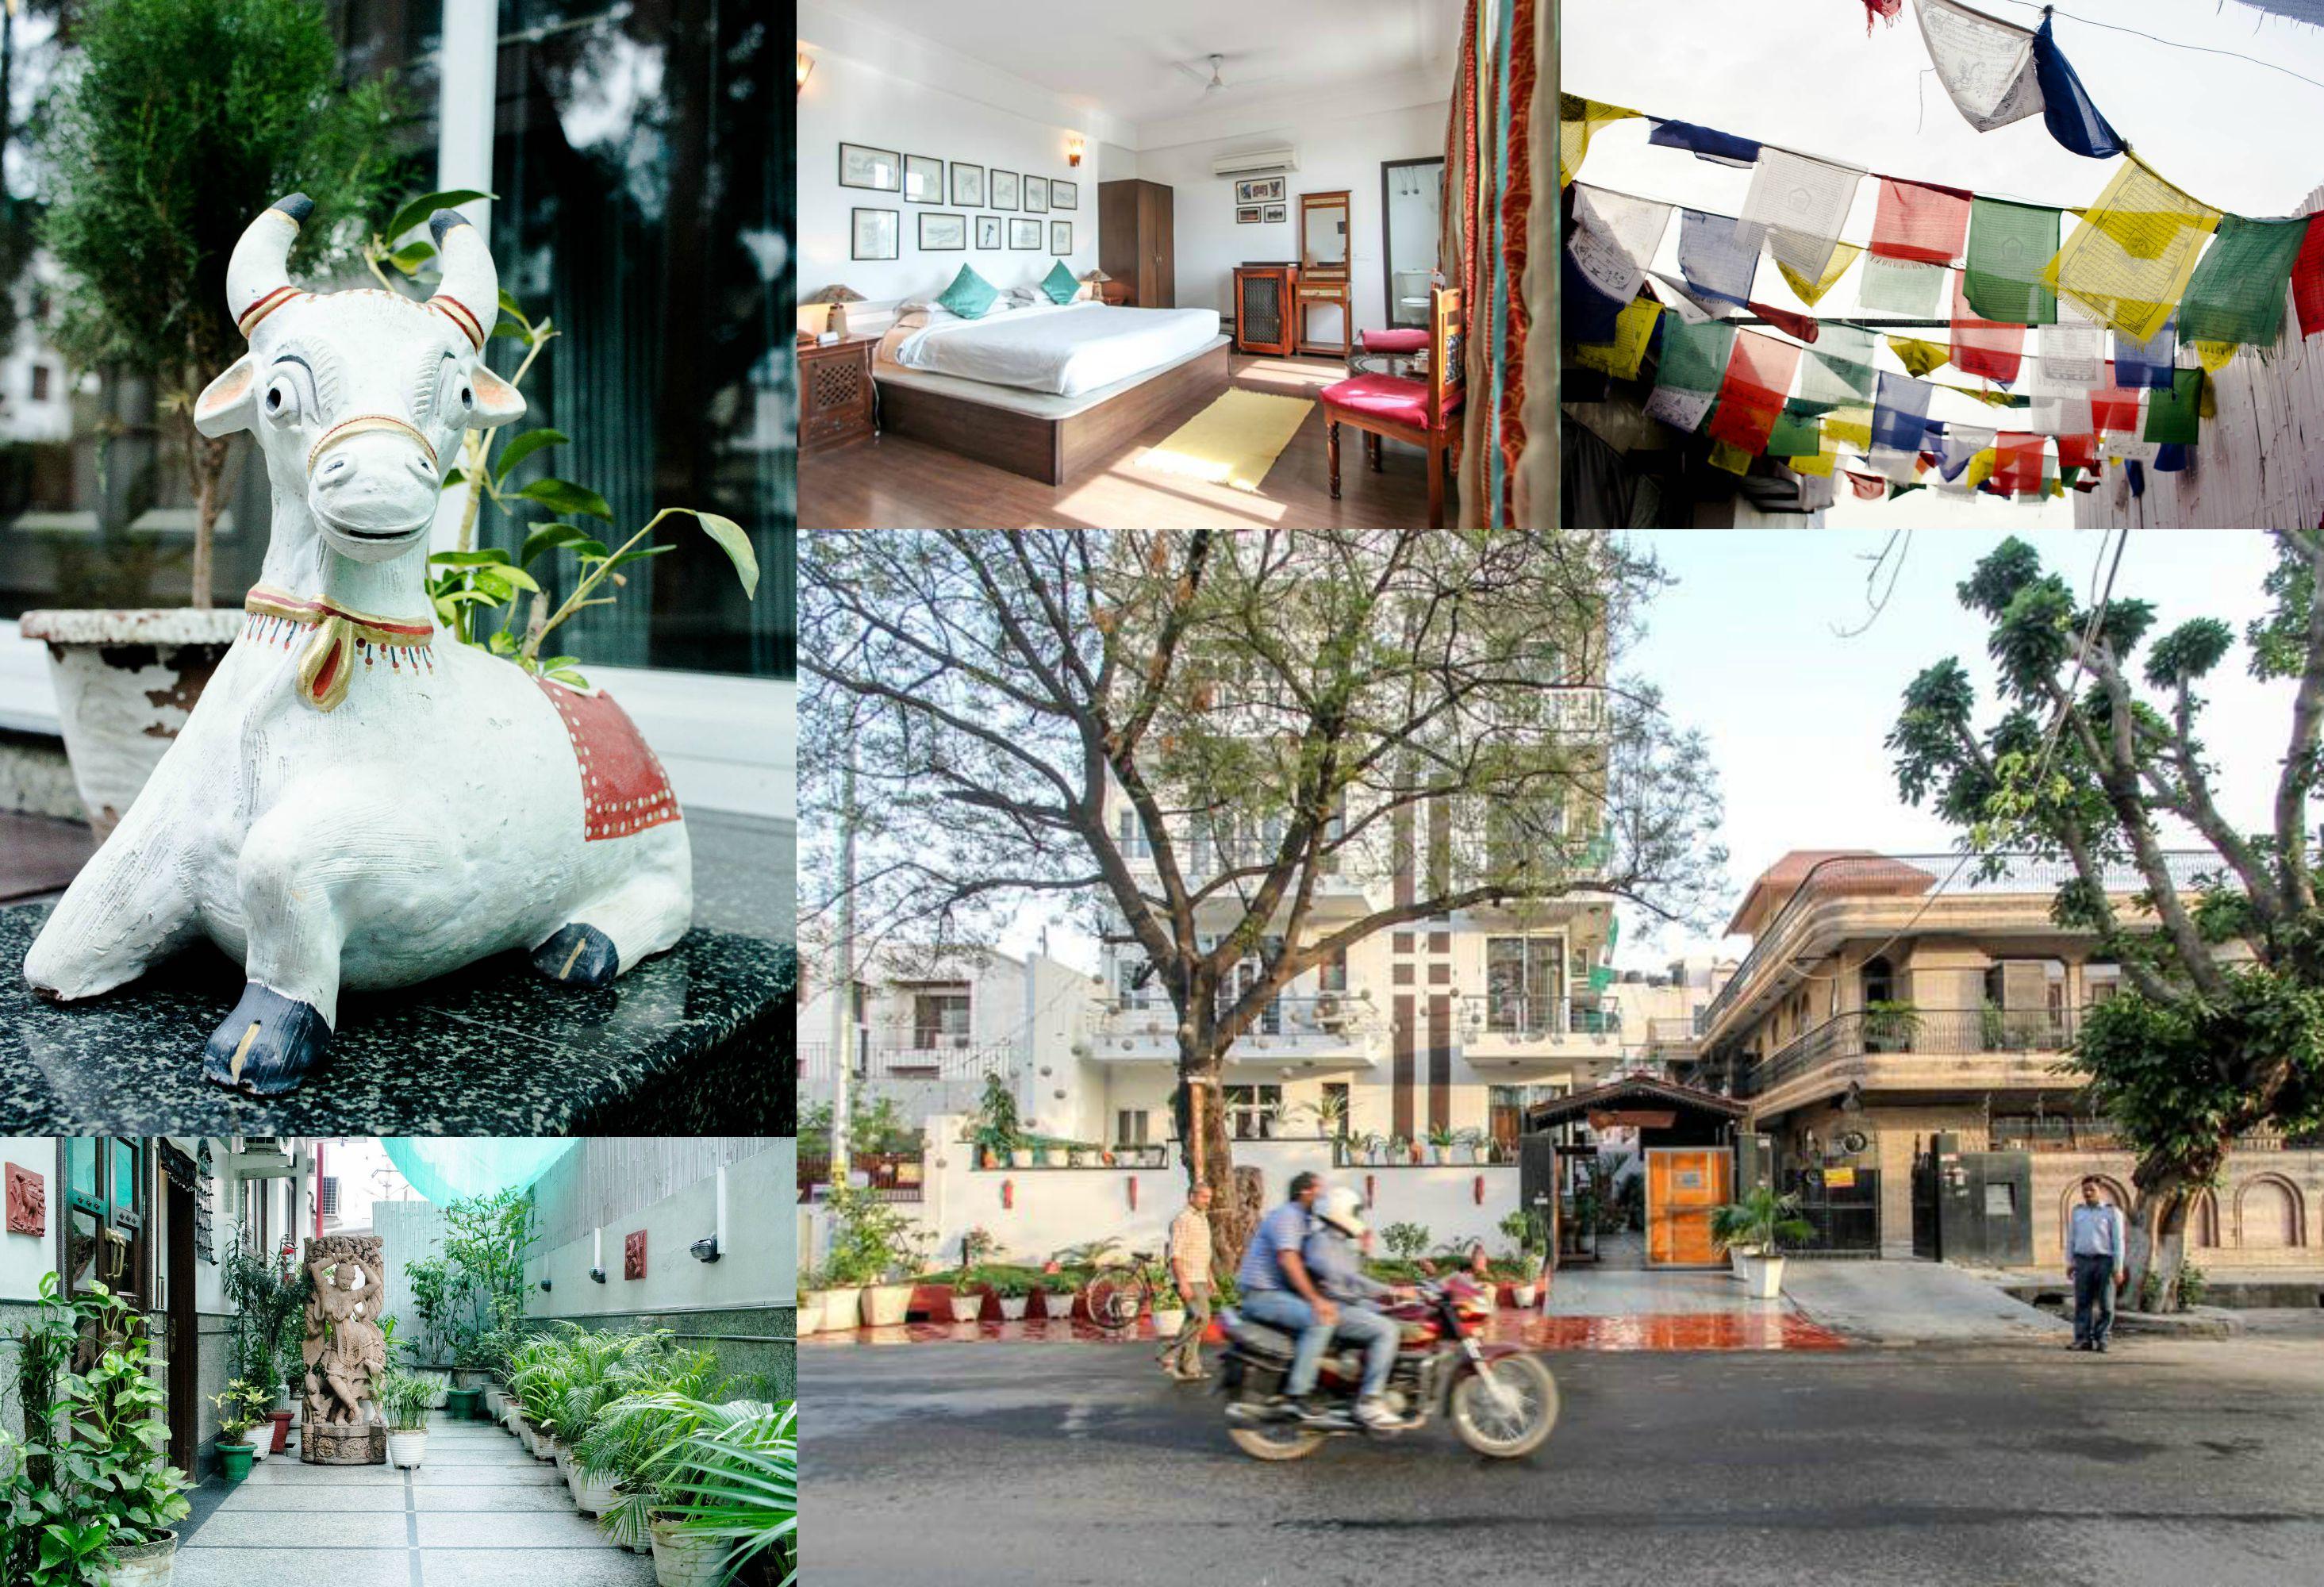 golden triangle rajasthan taj mahal jaipur delhi india tips must see kathi kamleitner travelettes-shanti home